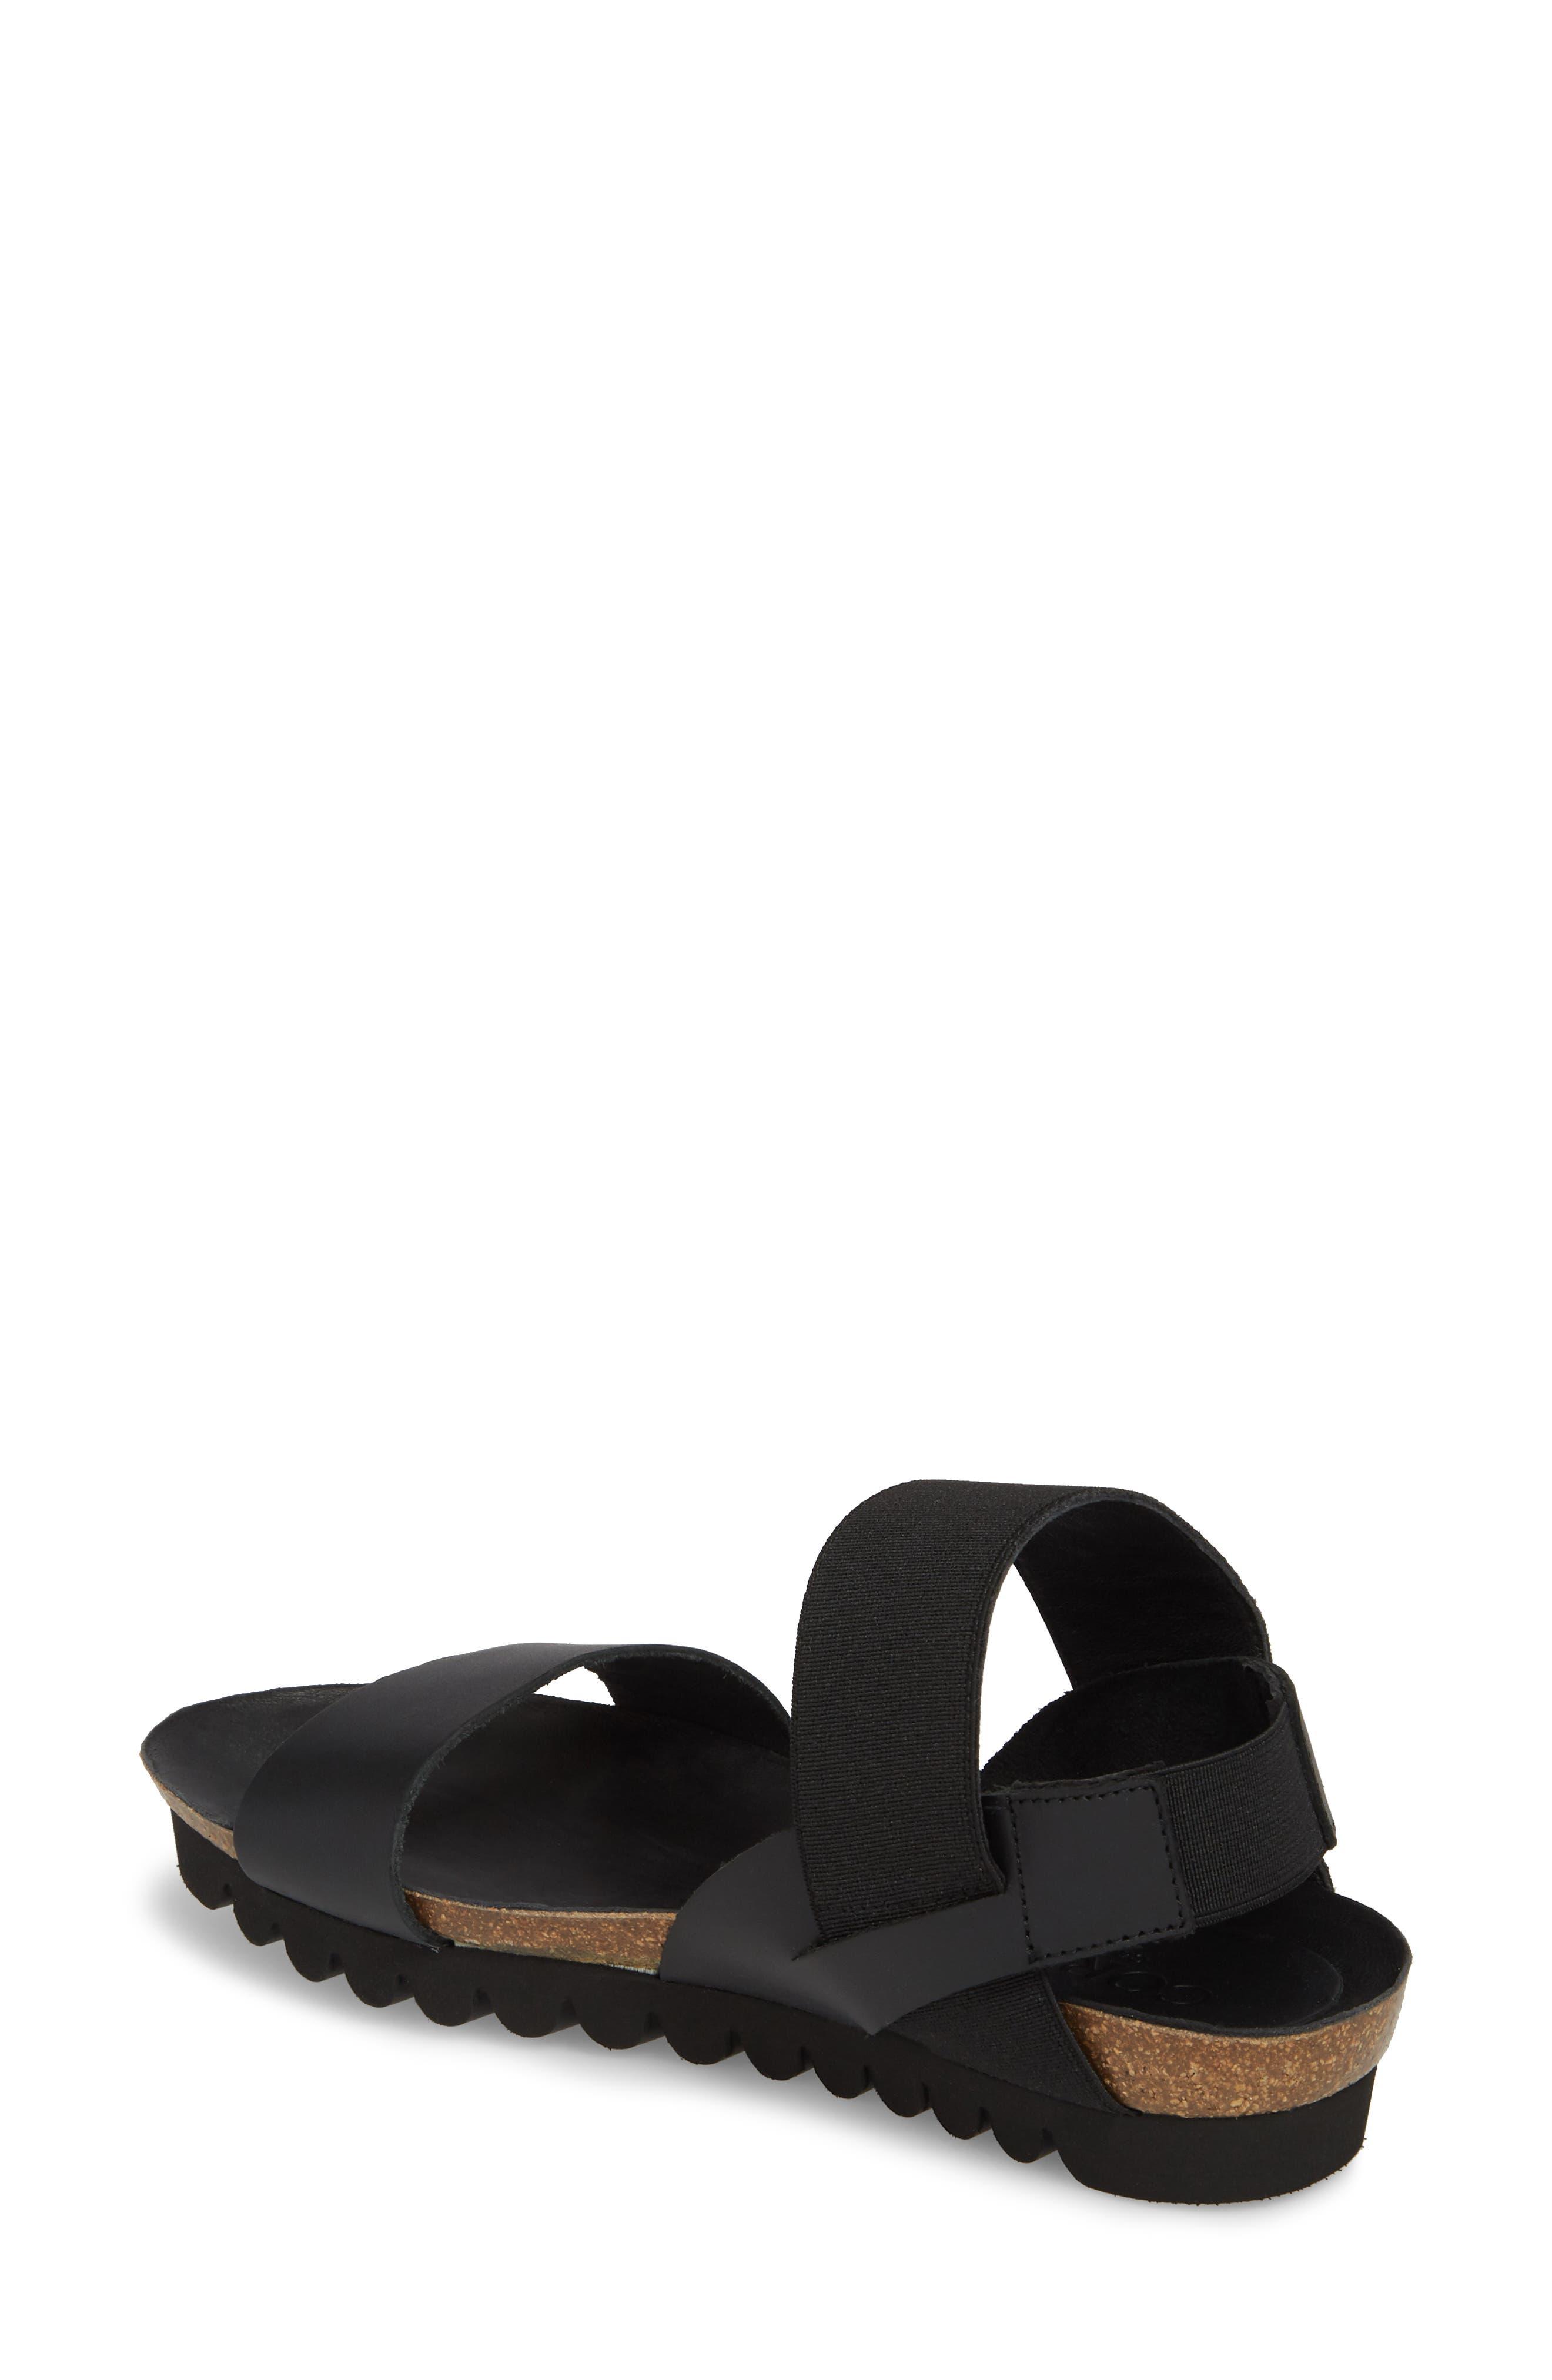 Luna Sandal,                             Alternate thumbnail 2, color,                             Black Leather